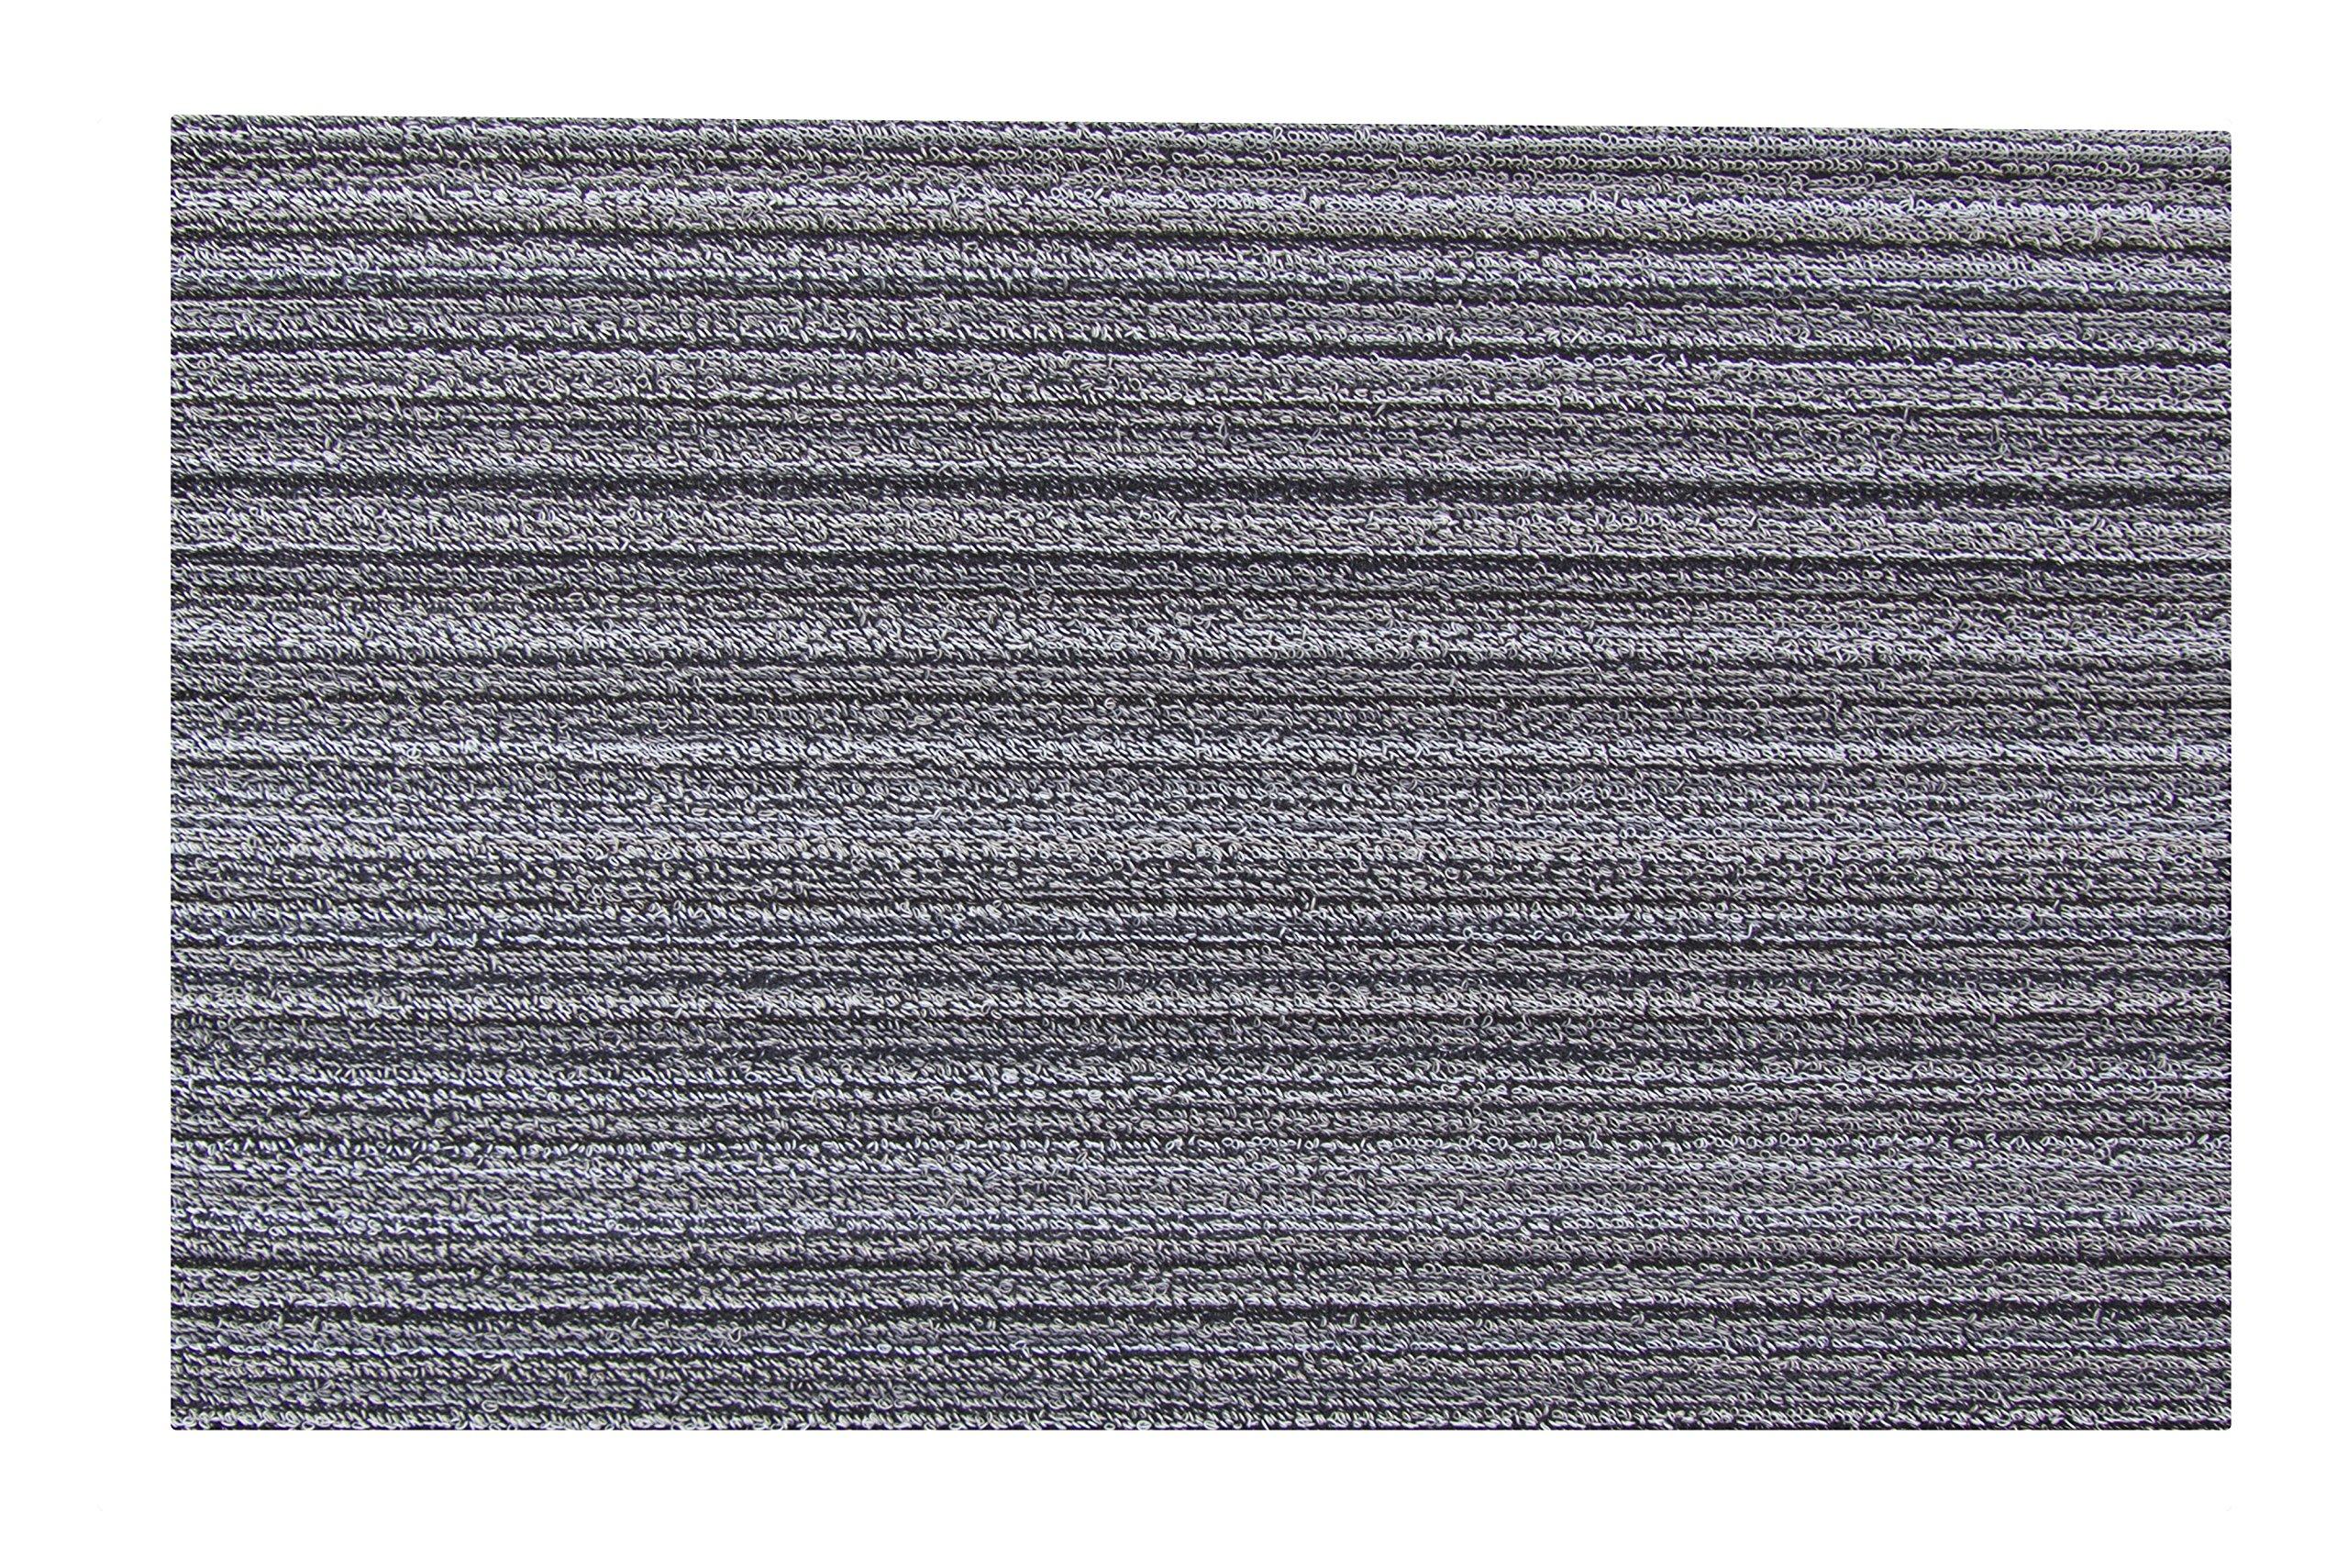 Chilewich Skinny Stripe Doormat, 18 by 28-Inch, Birch by Chilewich (Image #3)